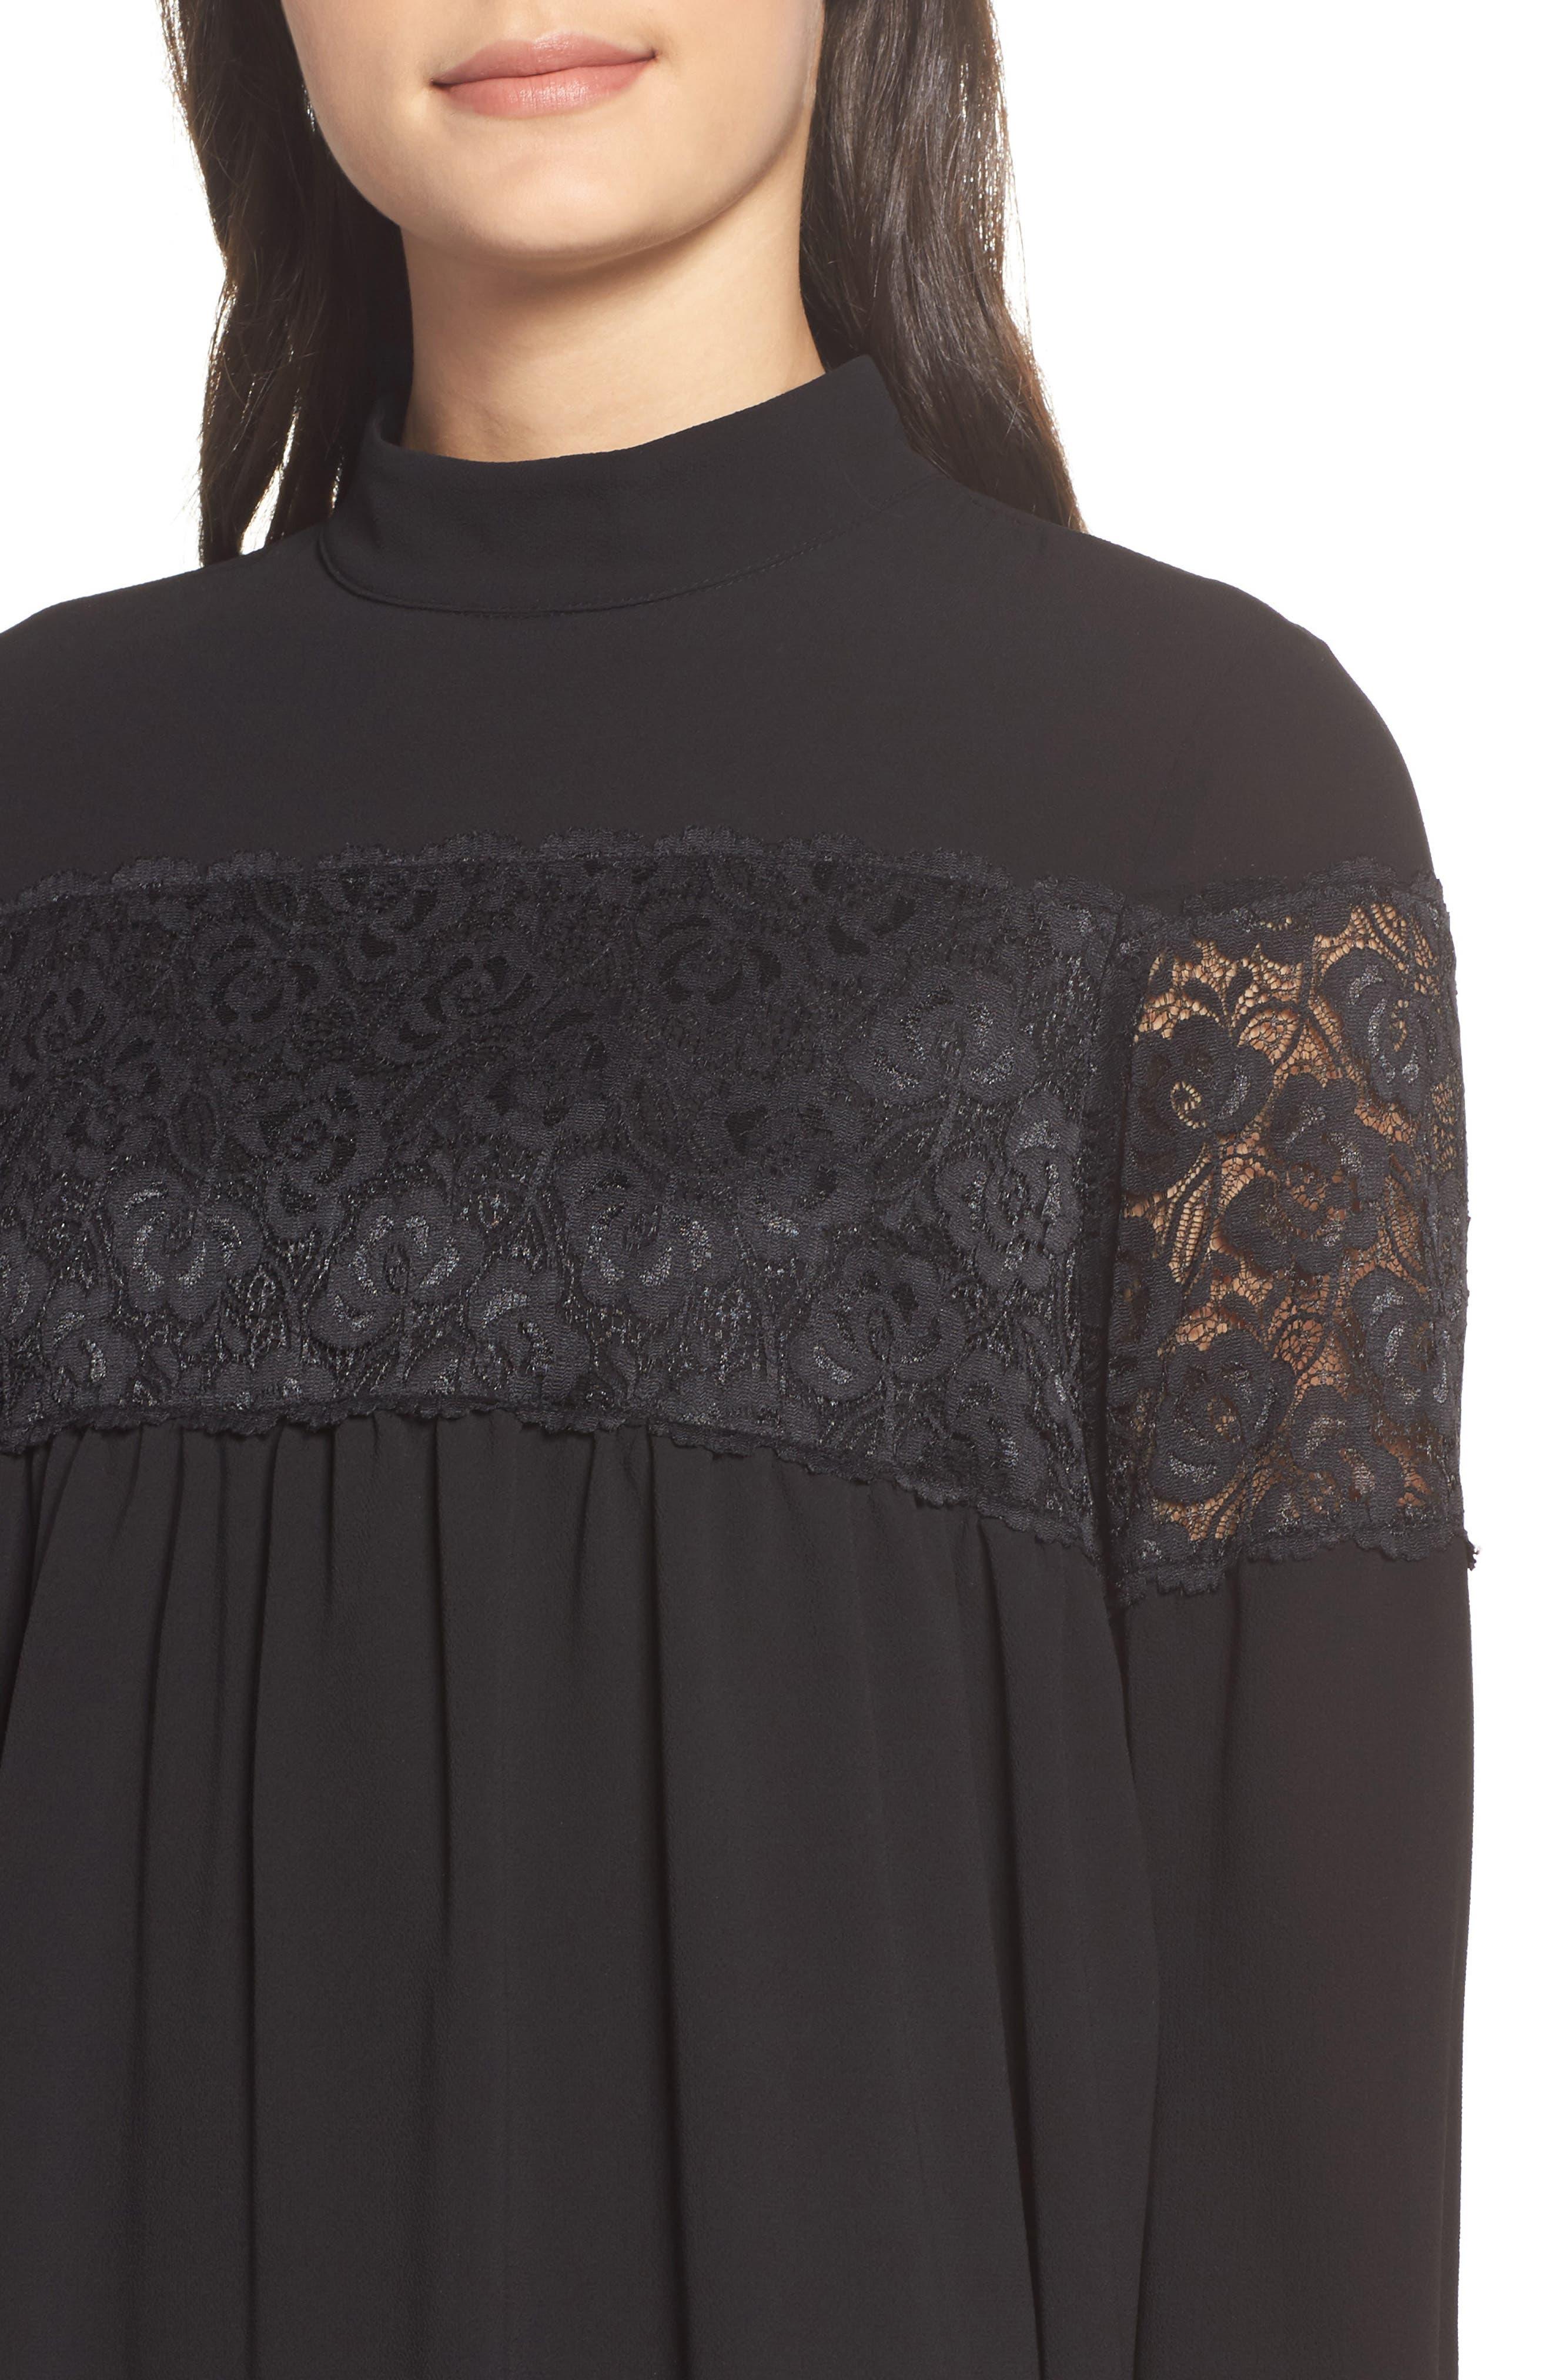 Mock Neck Shift Dress,                             Alternate thumbnail 4, color,                             Black